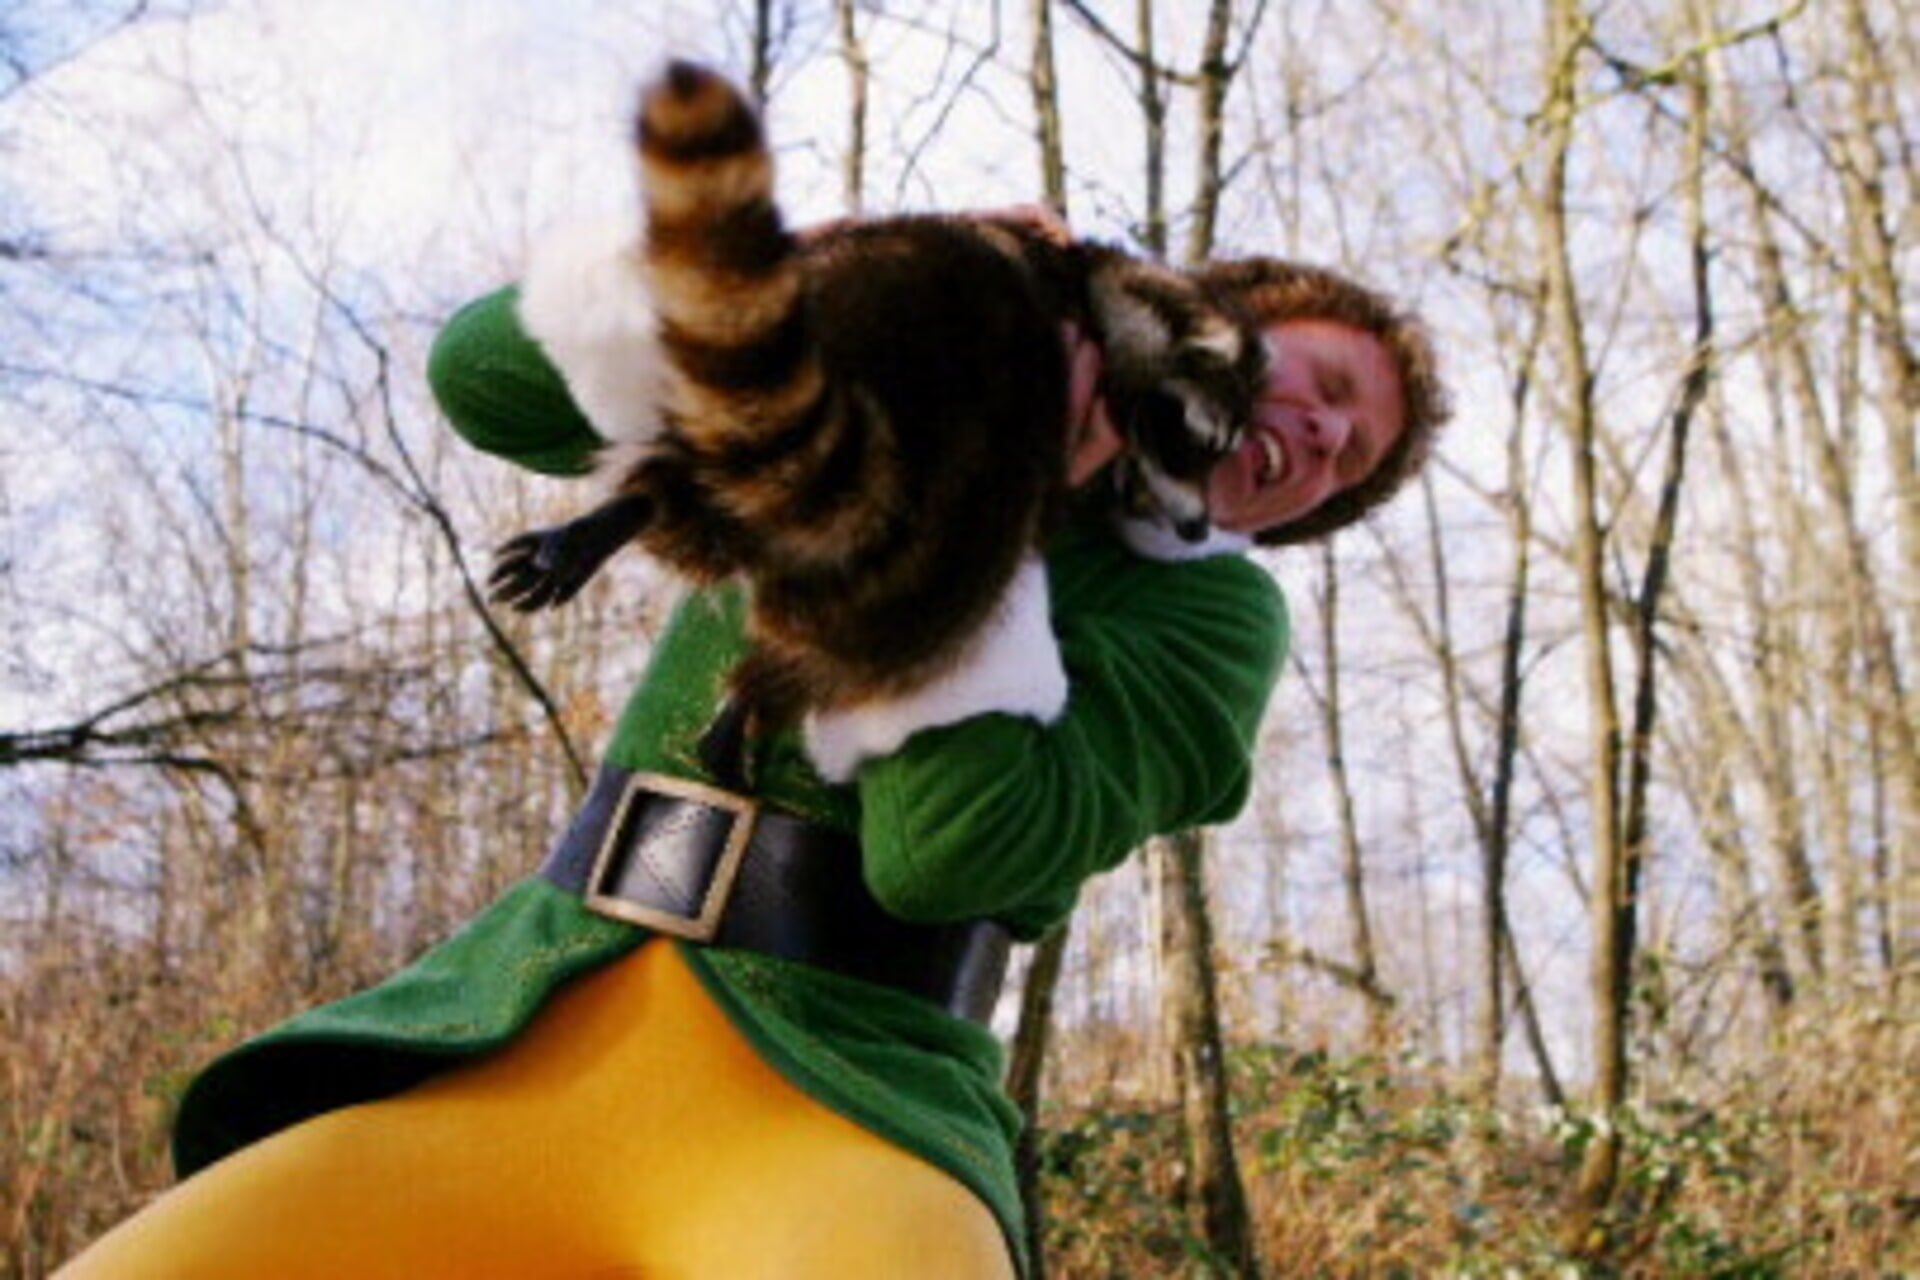 Elf - Image 11